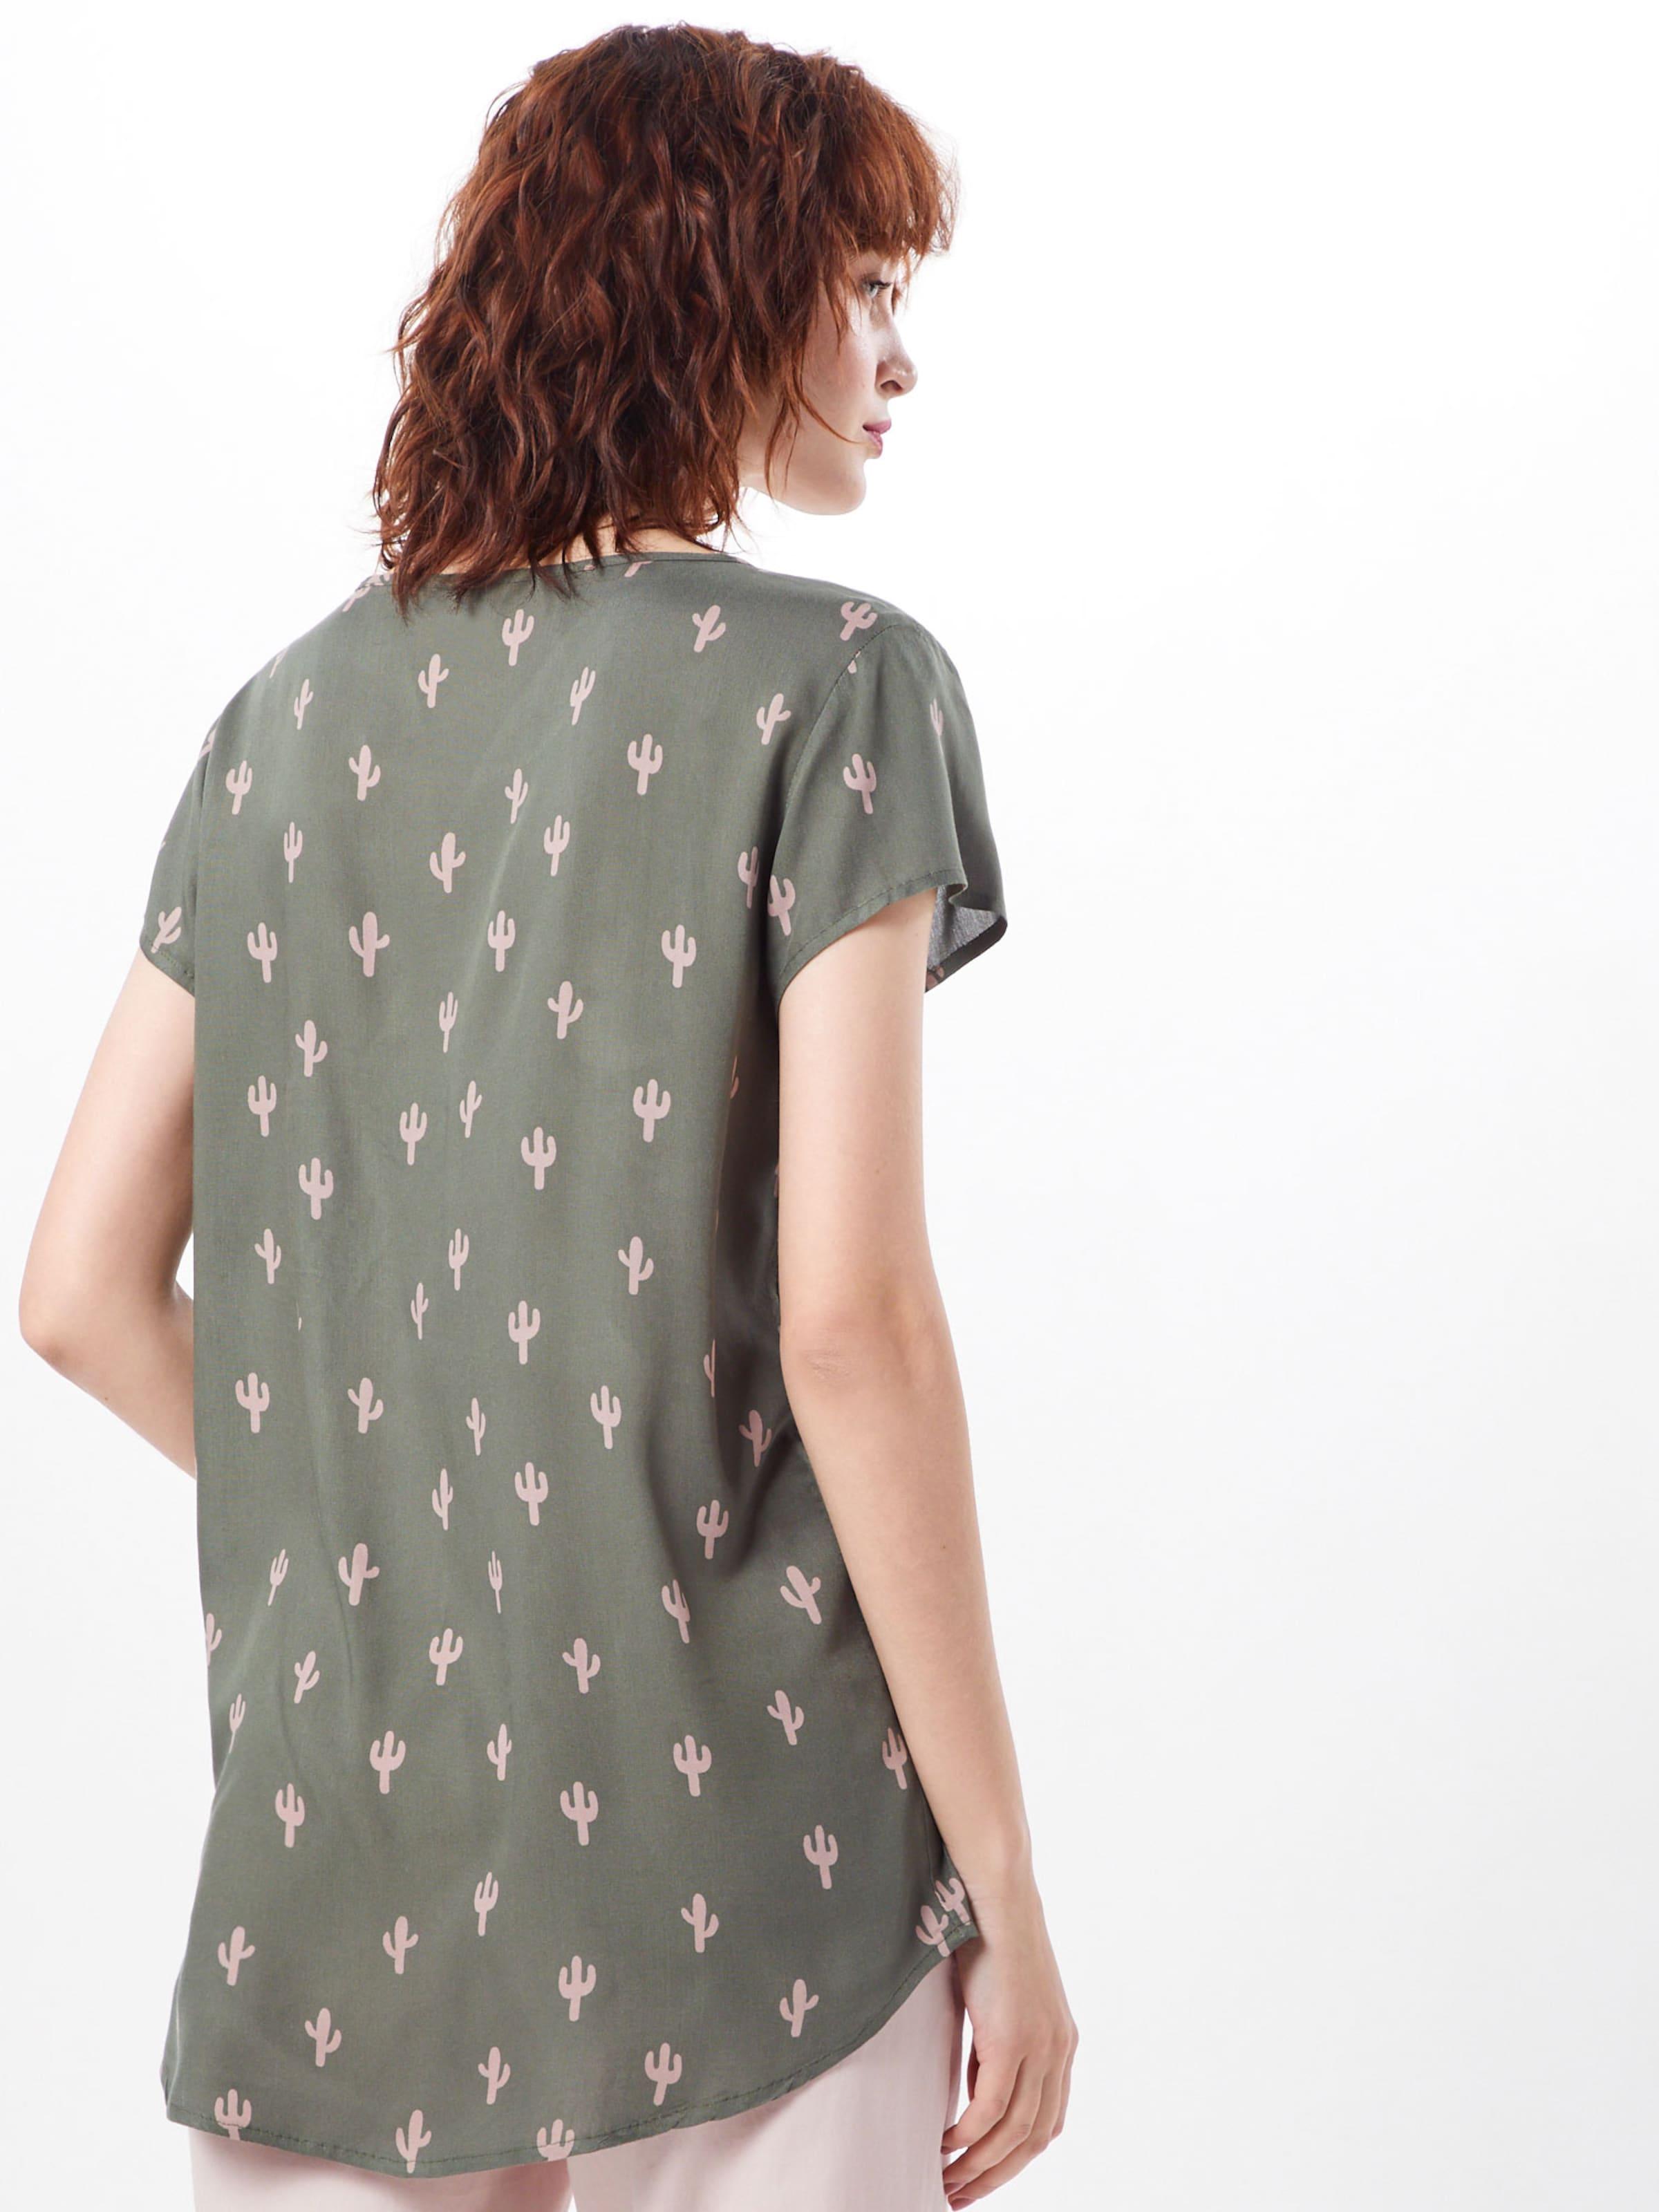 In shirt Jacqueline BasaltgrauRosa De T Yong UqpVSzM